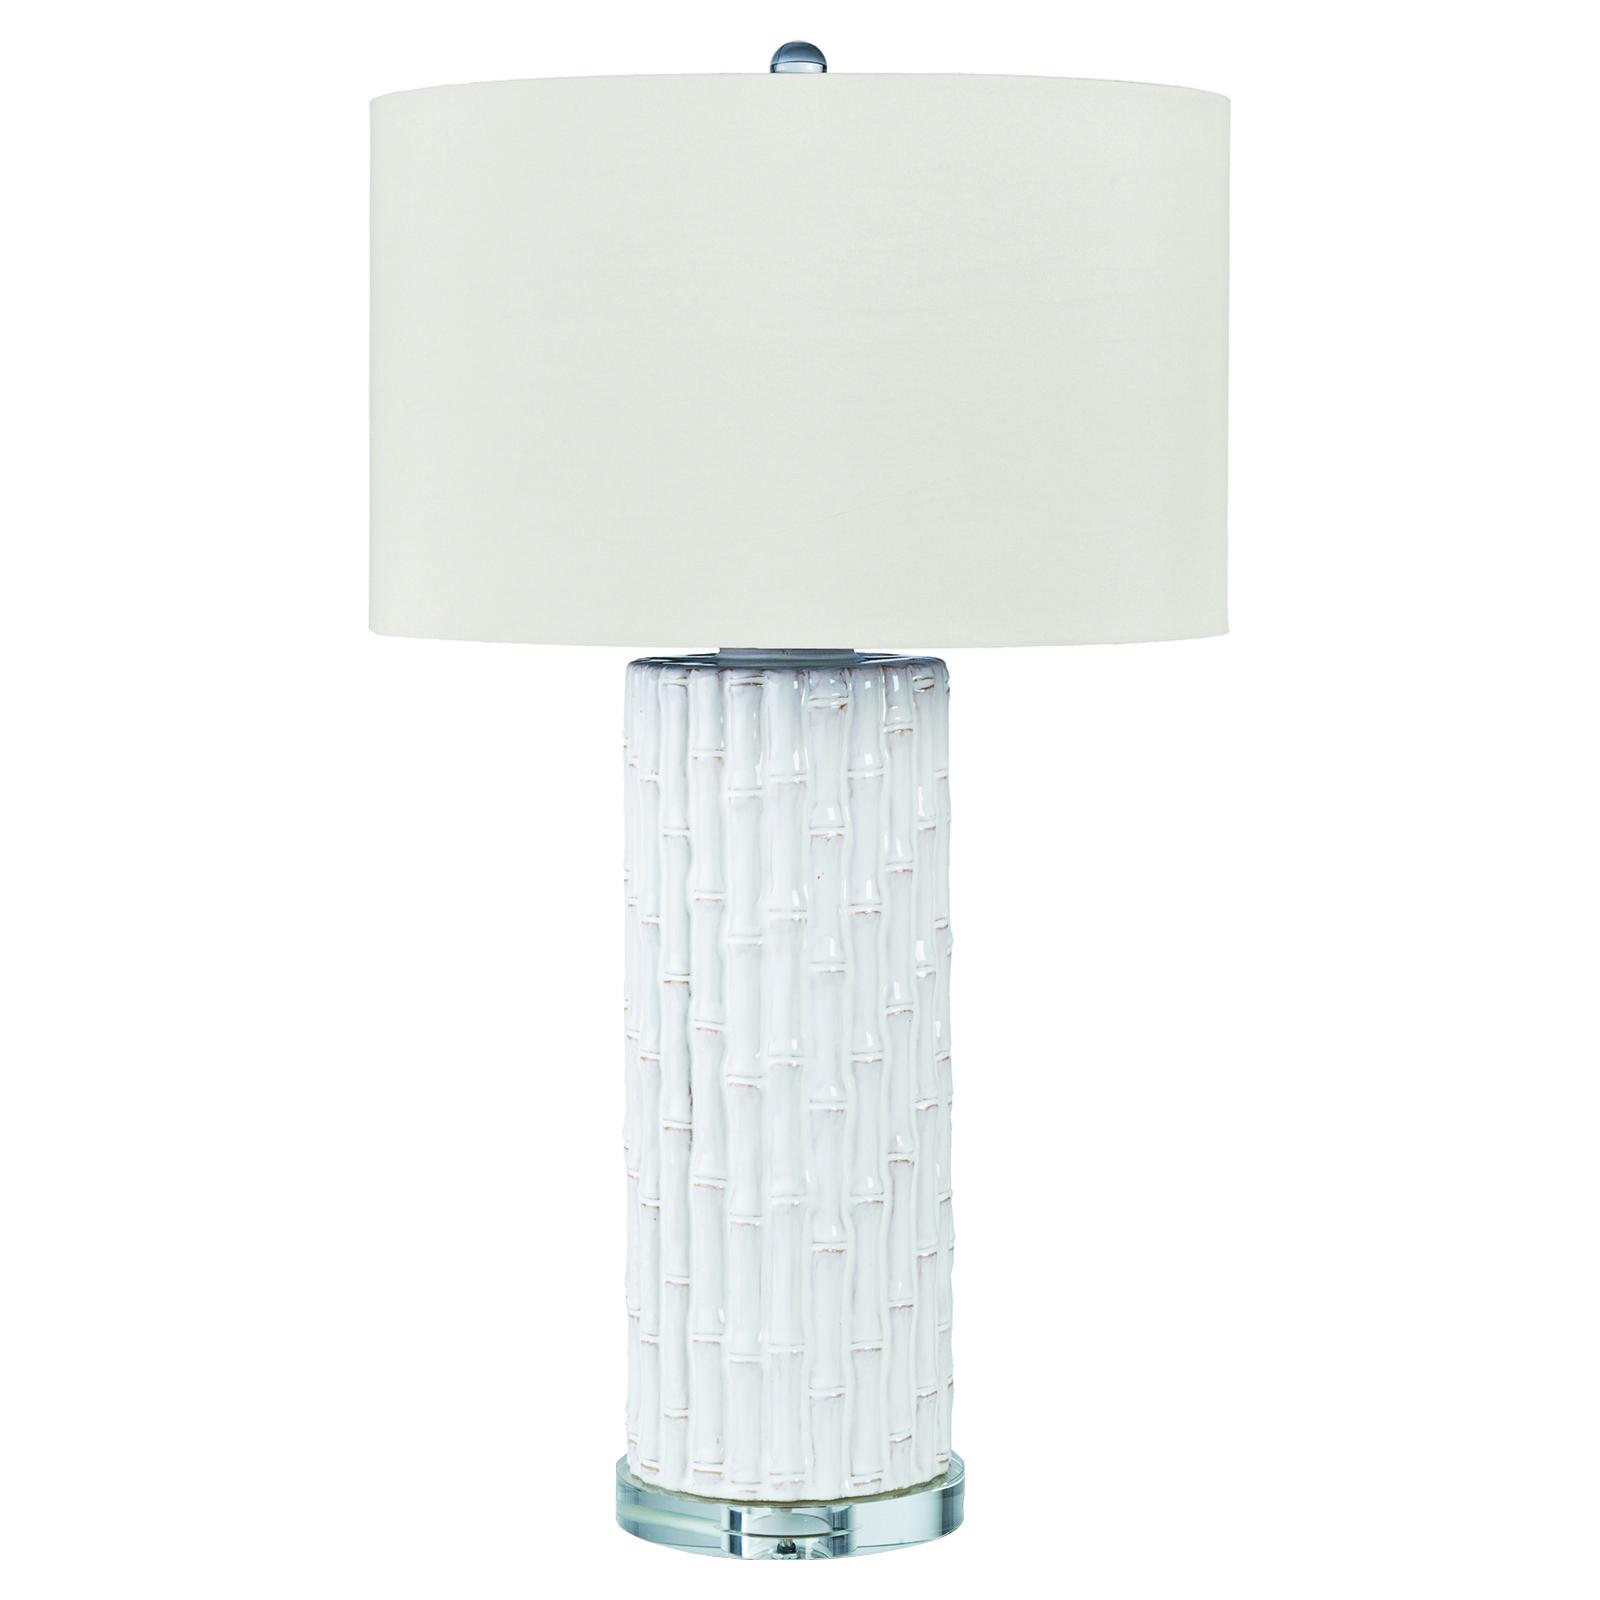 Bambusa Bazaar White Bamboo Ceramic Column Table Lamp